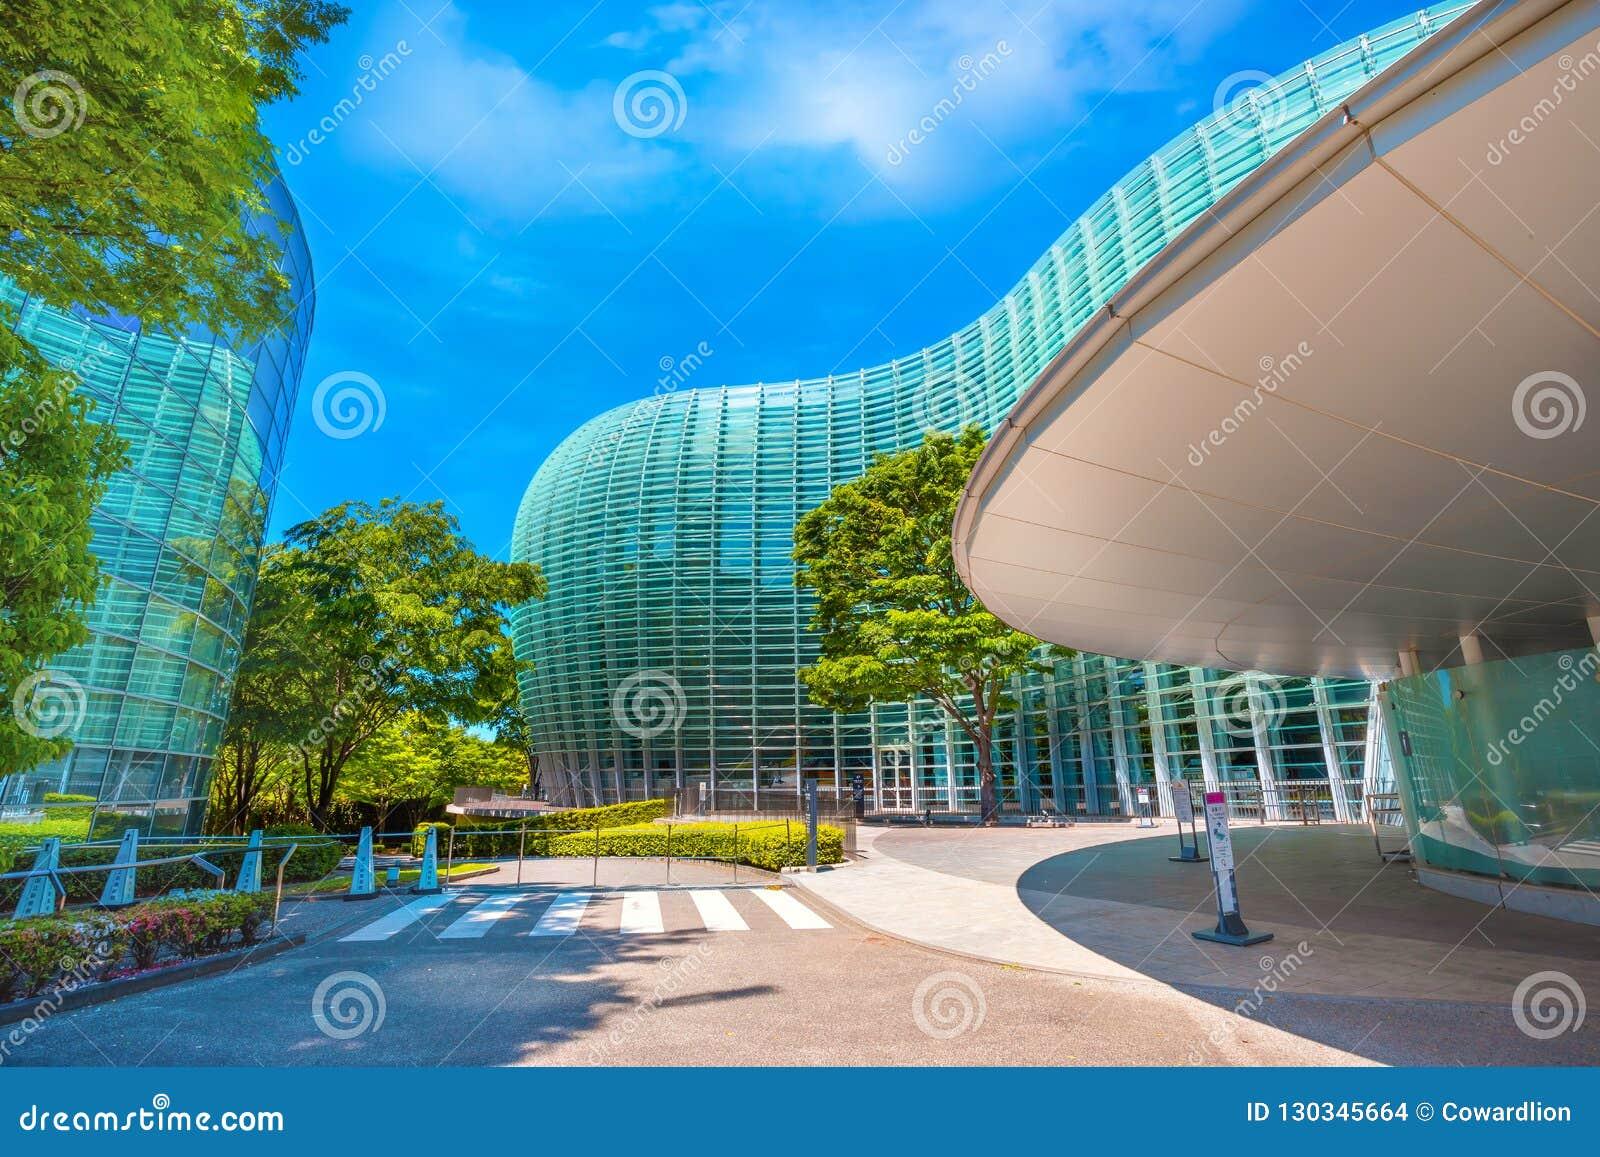 Art Center nazionale in Roppongi, Tokyo, Giappone